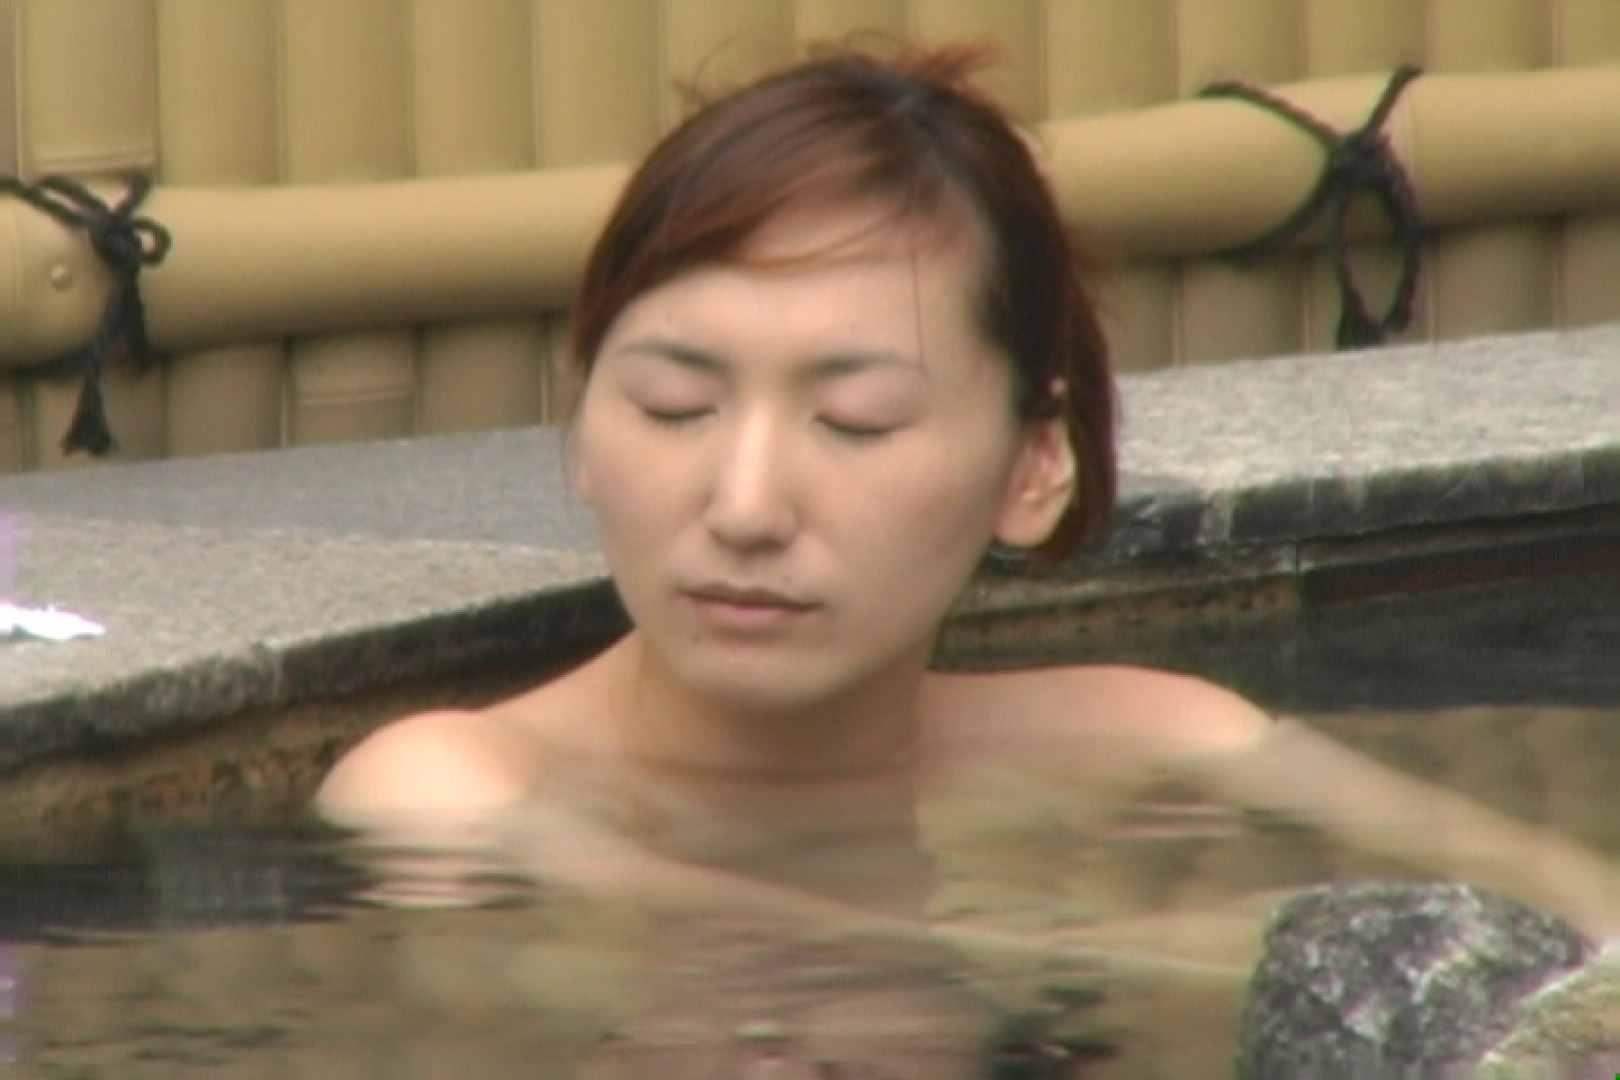 Aquaな露天風呂Vol.616 露天風呂編   盗撮シリーズ  89PIX 49